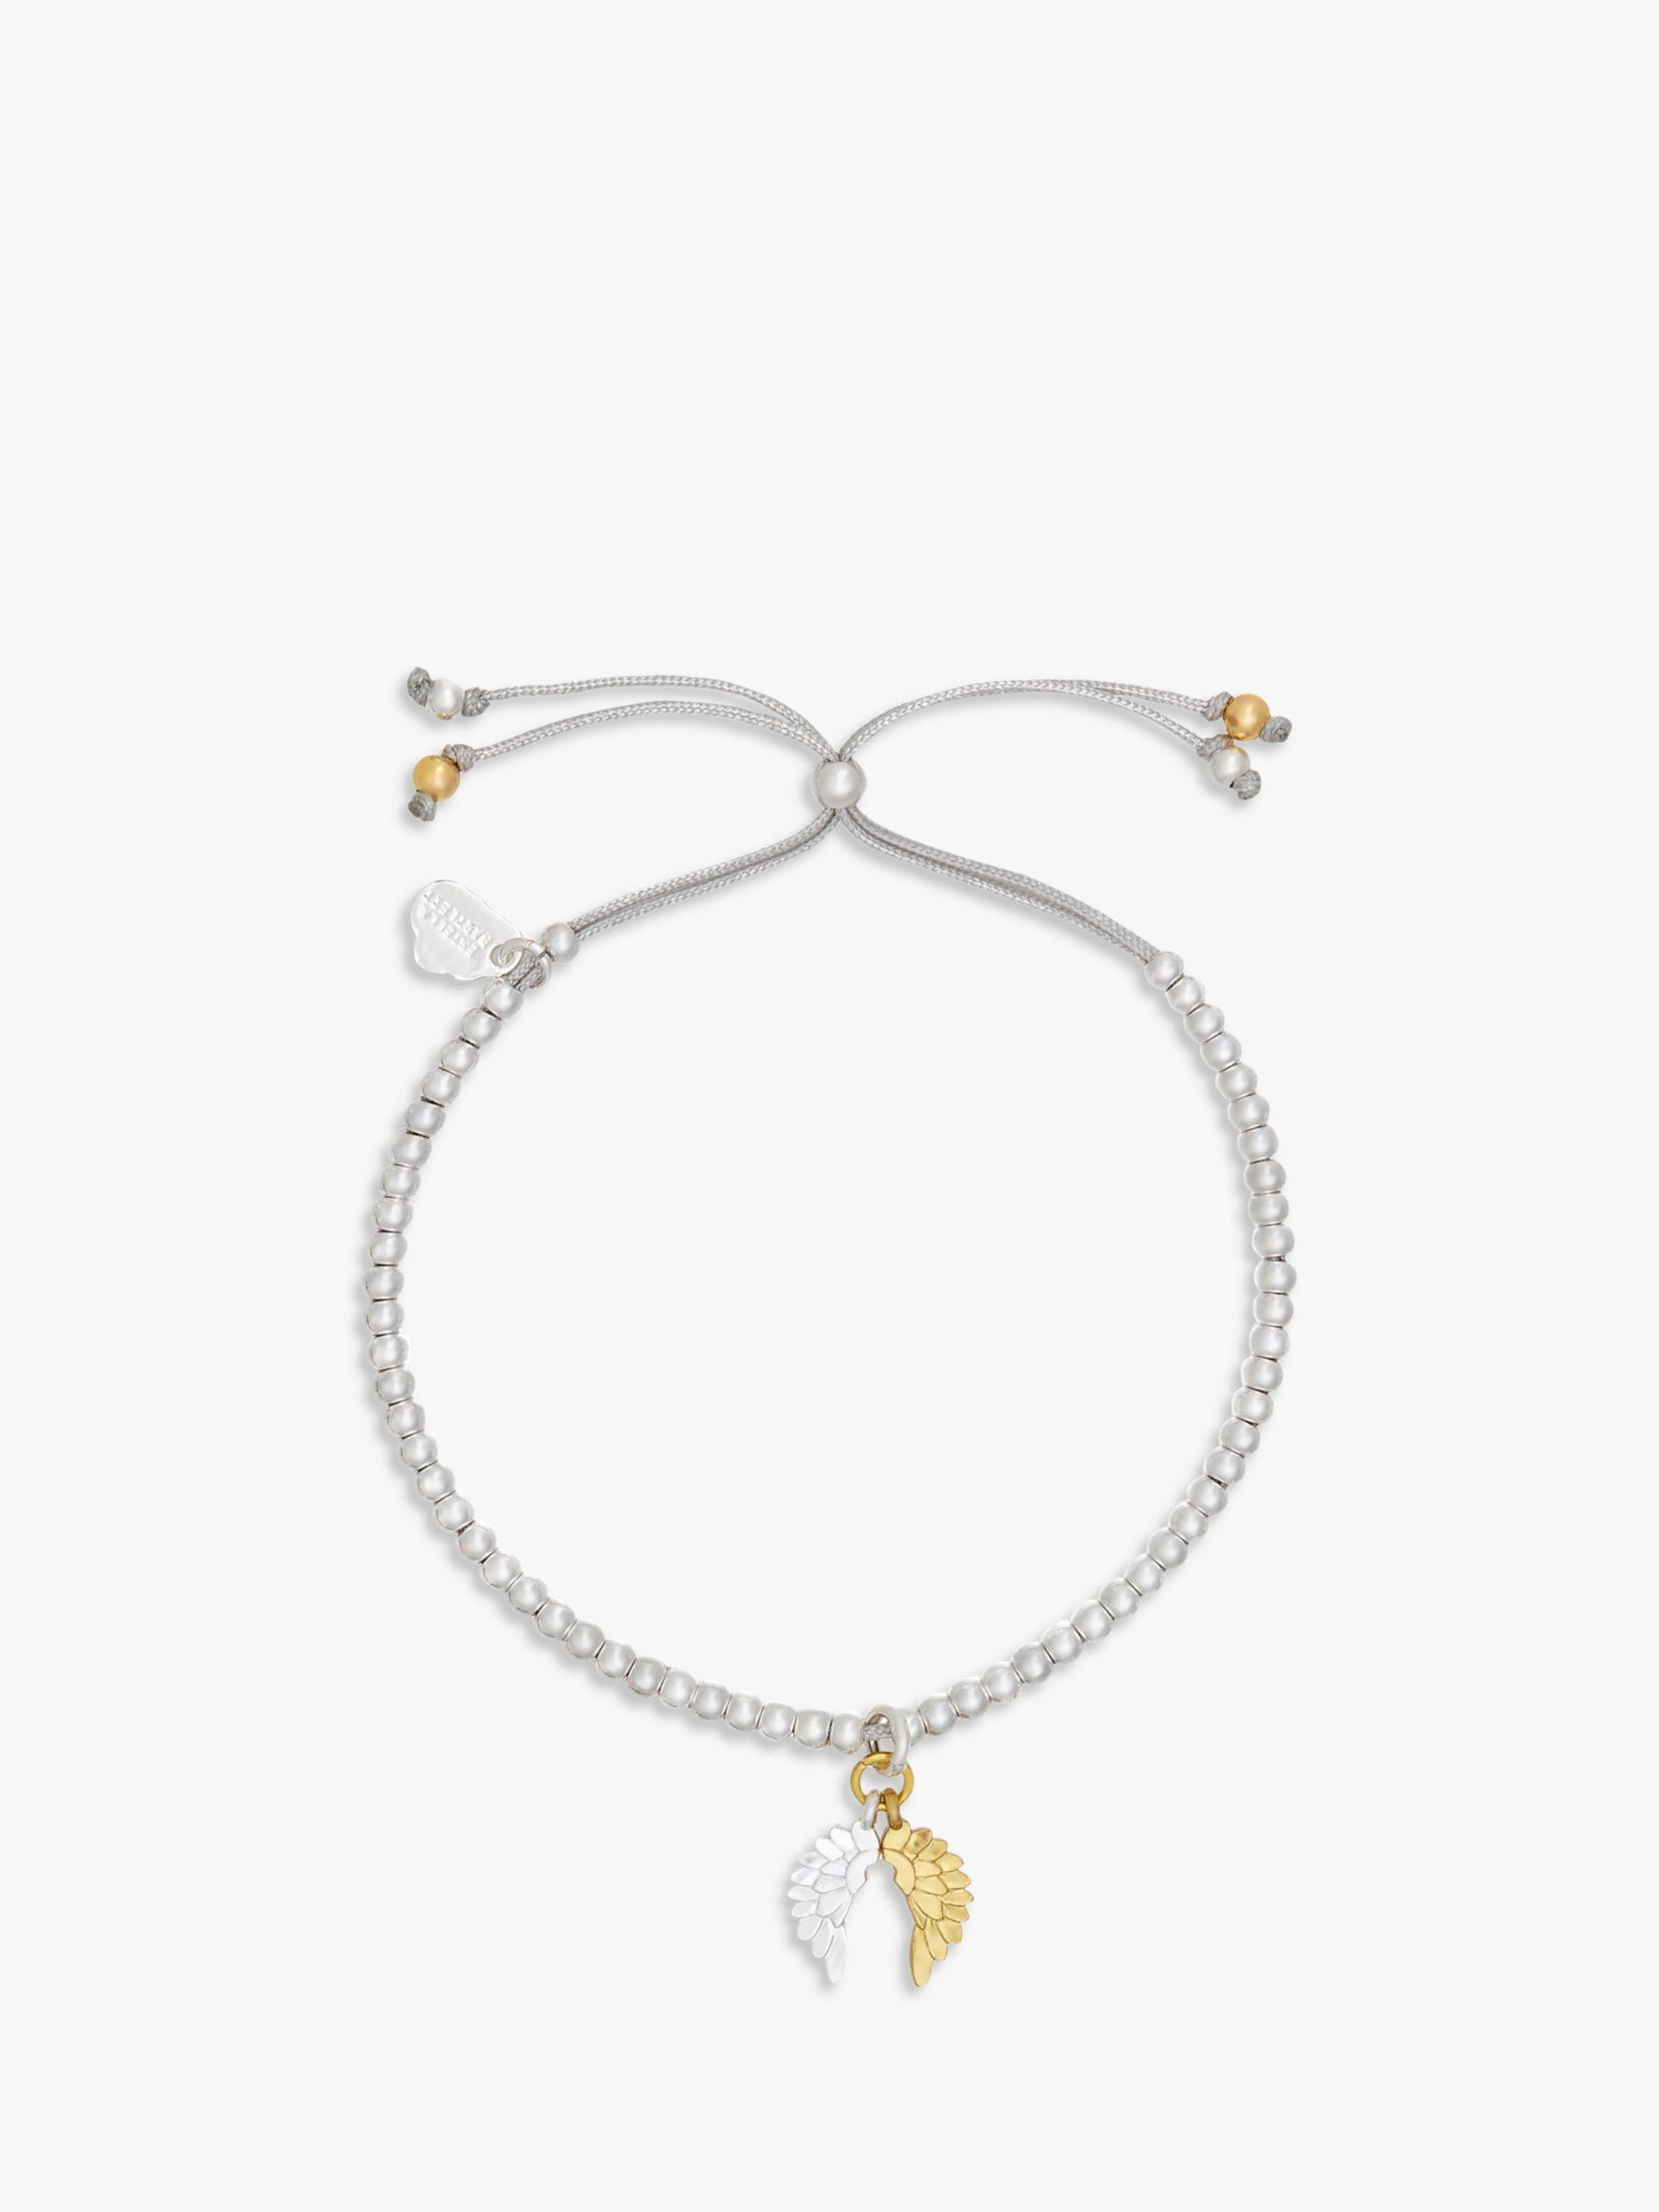 Estella Bartlett Estella Bartlett Liberty Wings Beaded Bracelet, Silver/Gold